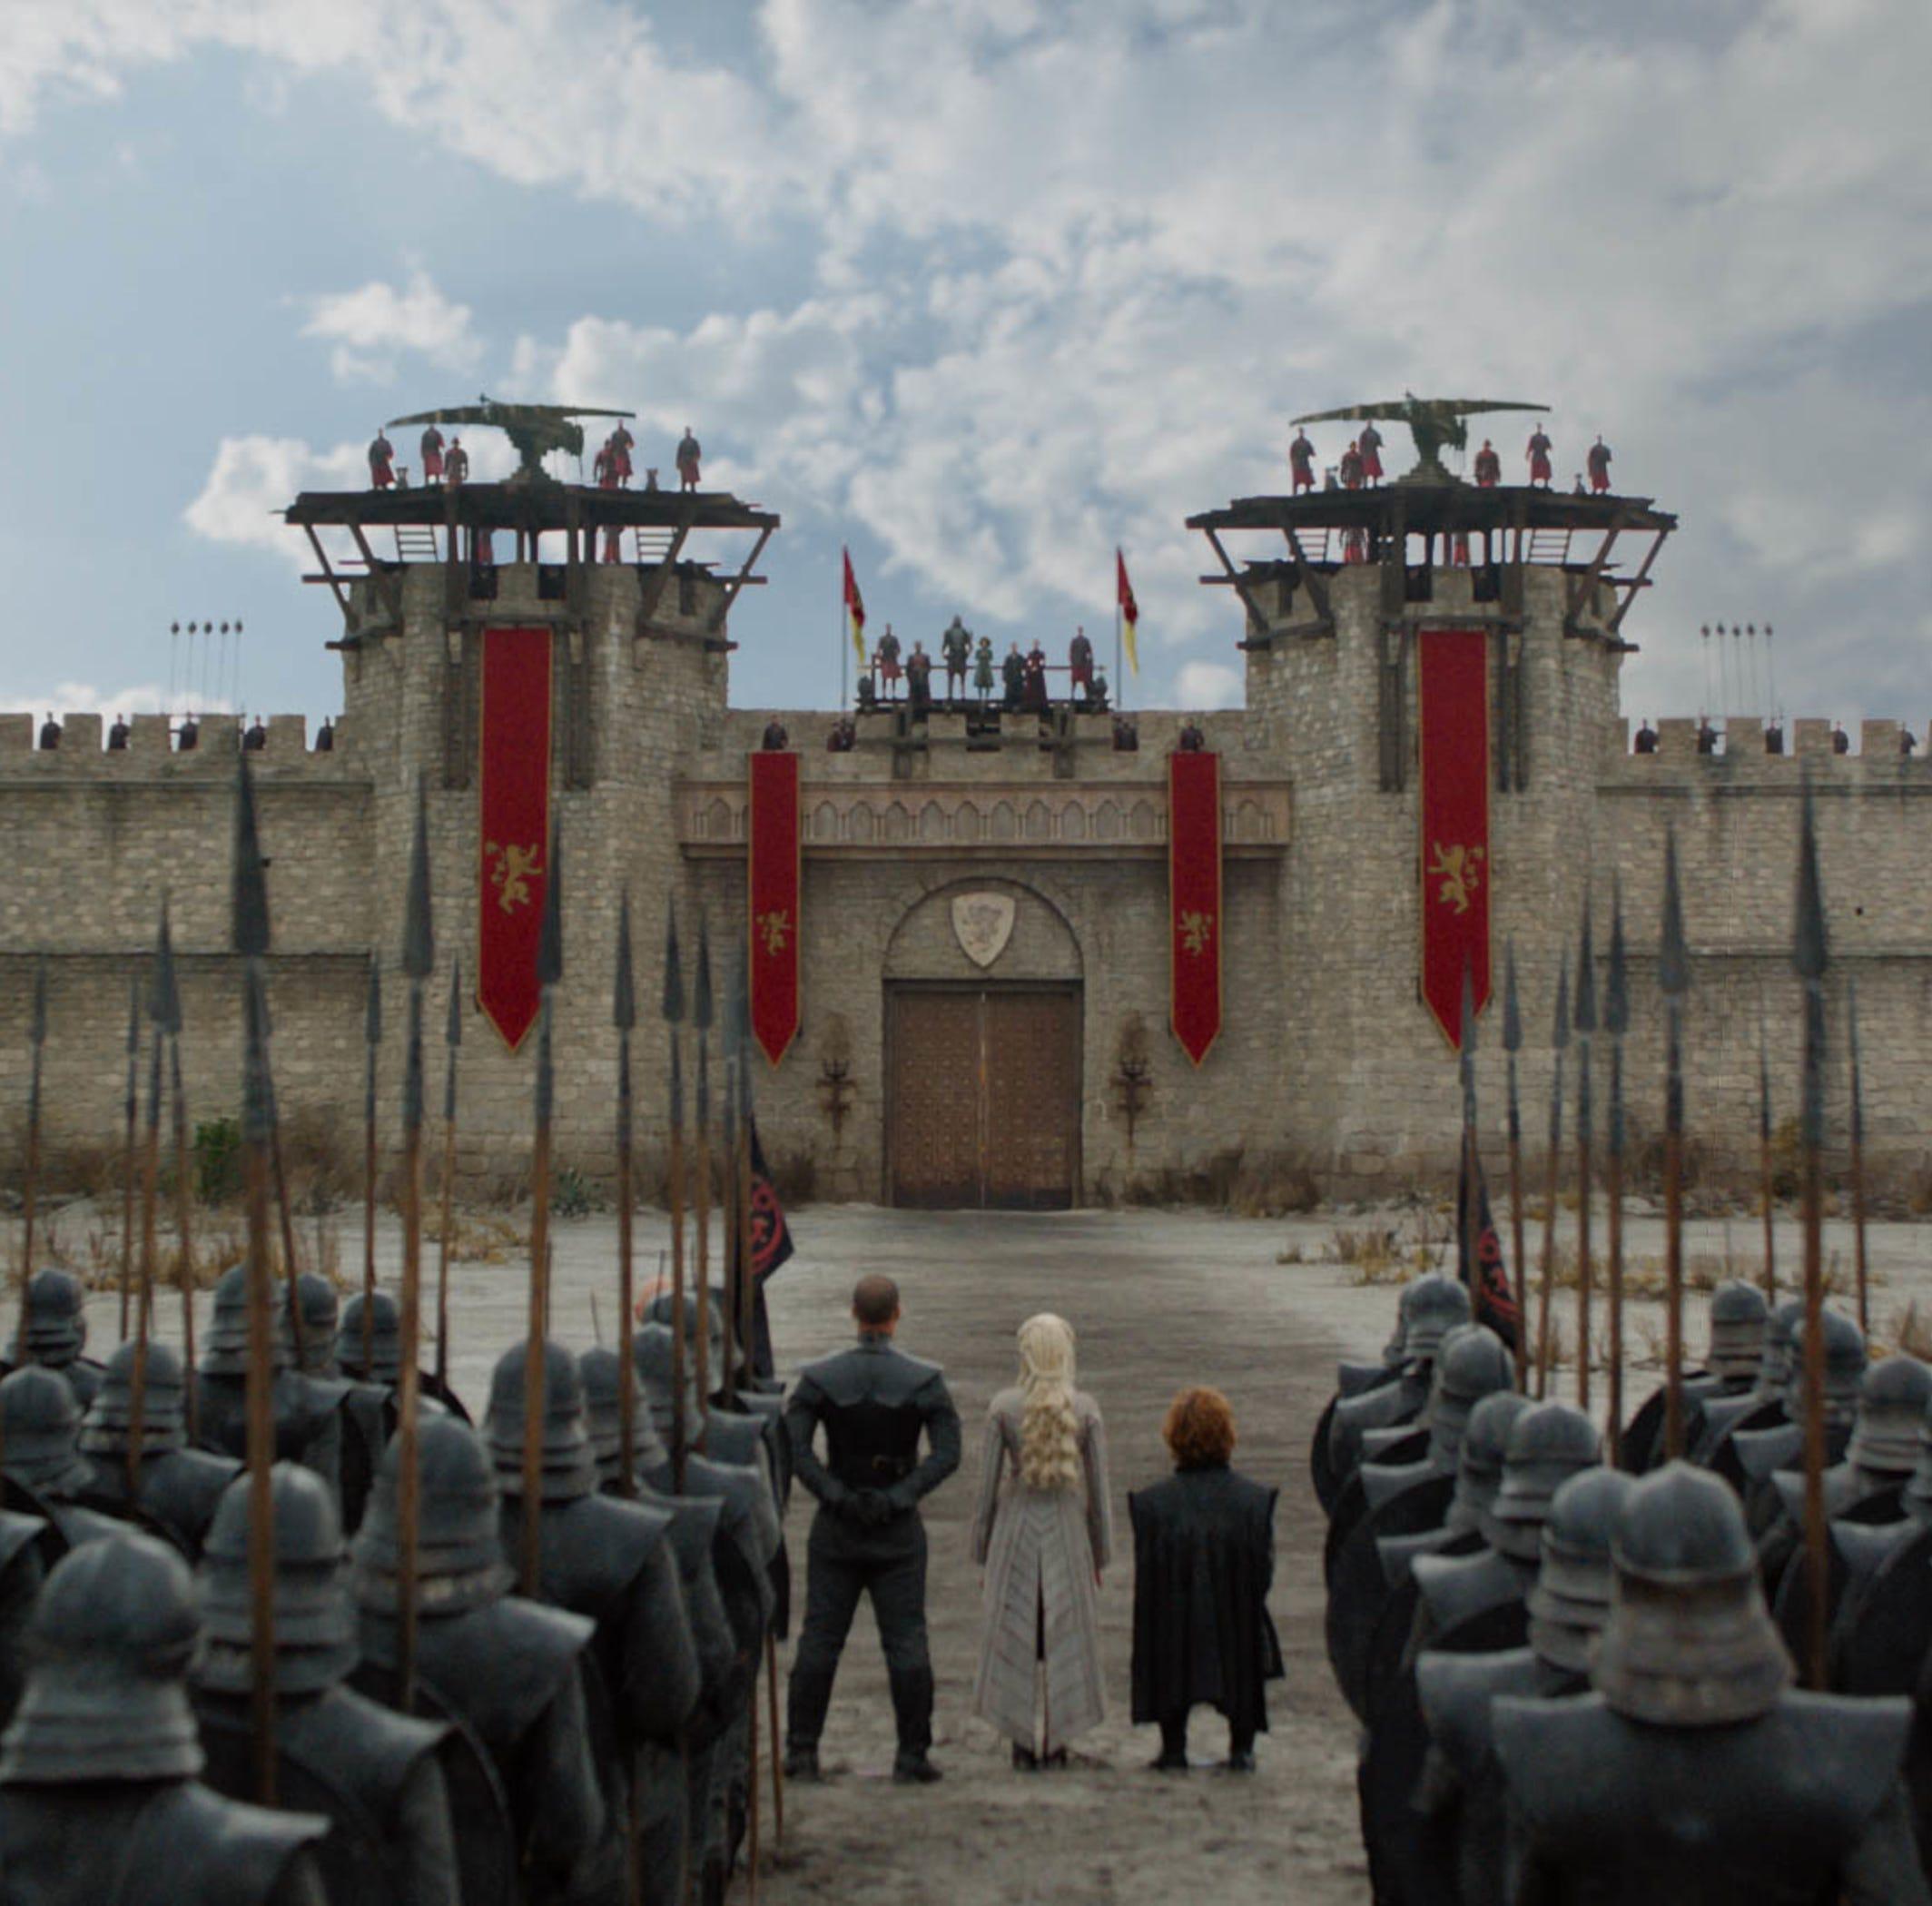 Daenerys Targaryen (Emilia Clarke), center, arrive at King's Landing to demand Cersei Lannister's surrender.